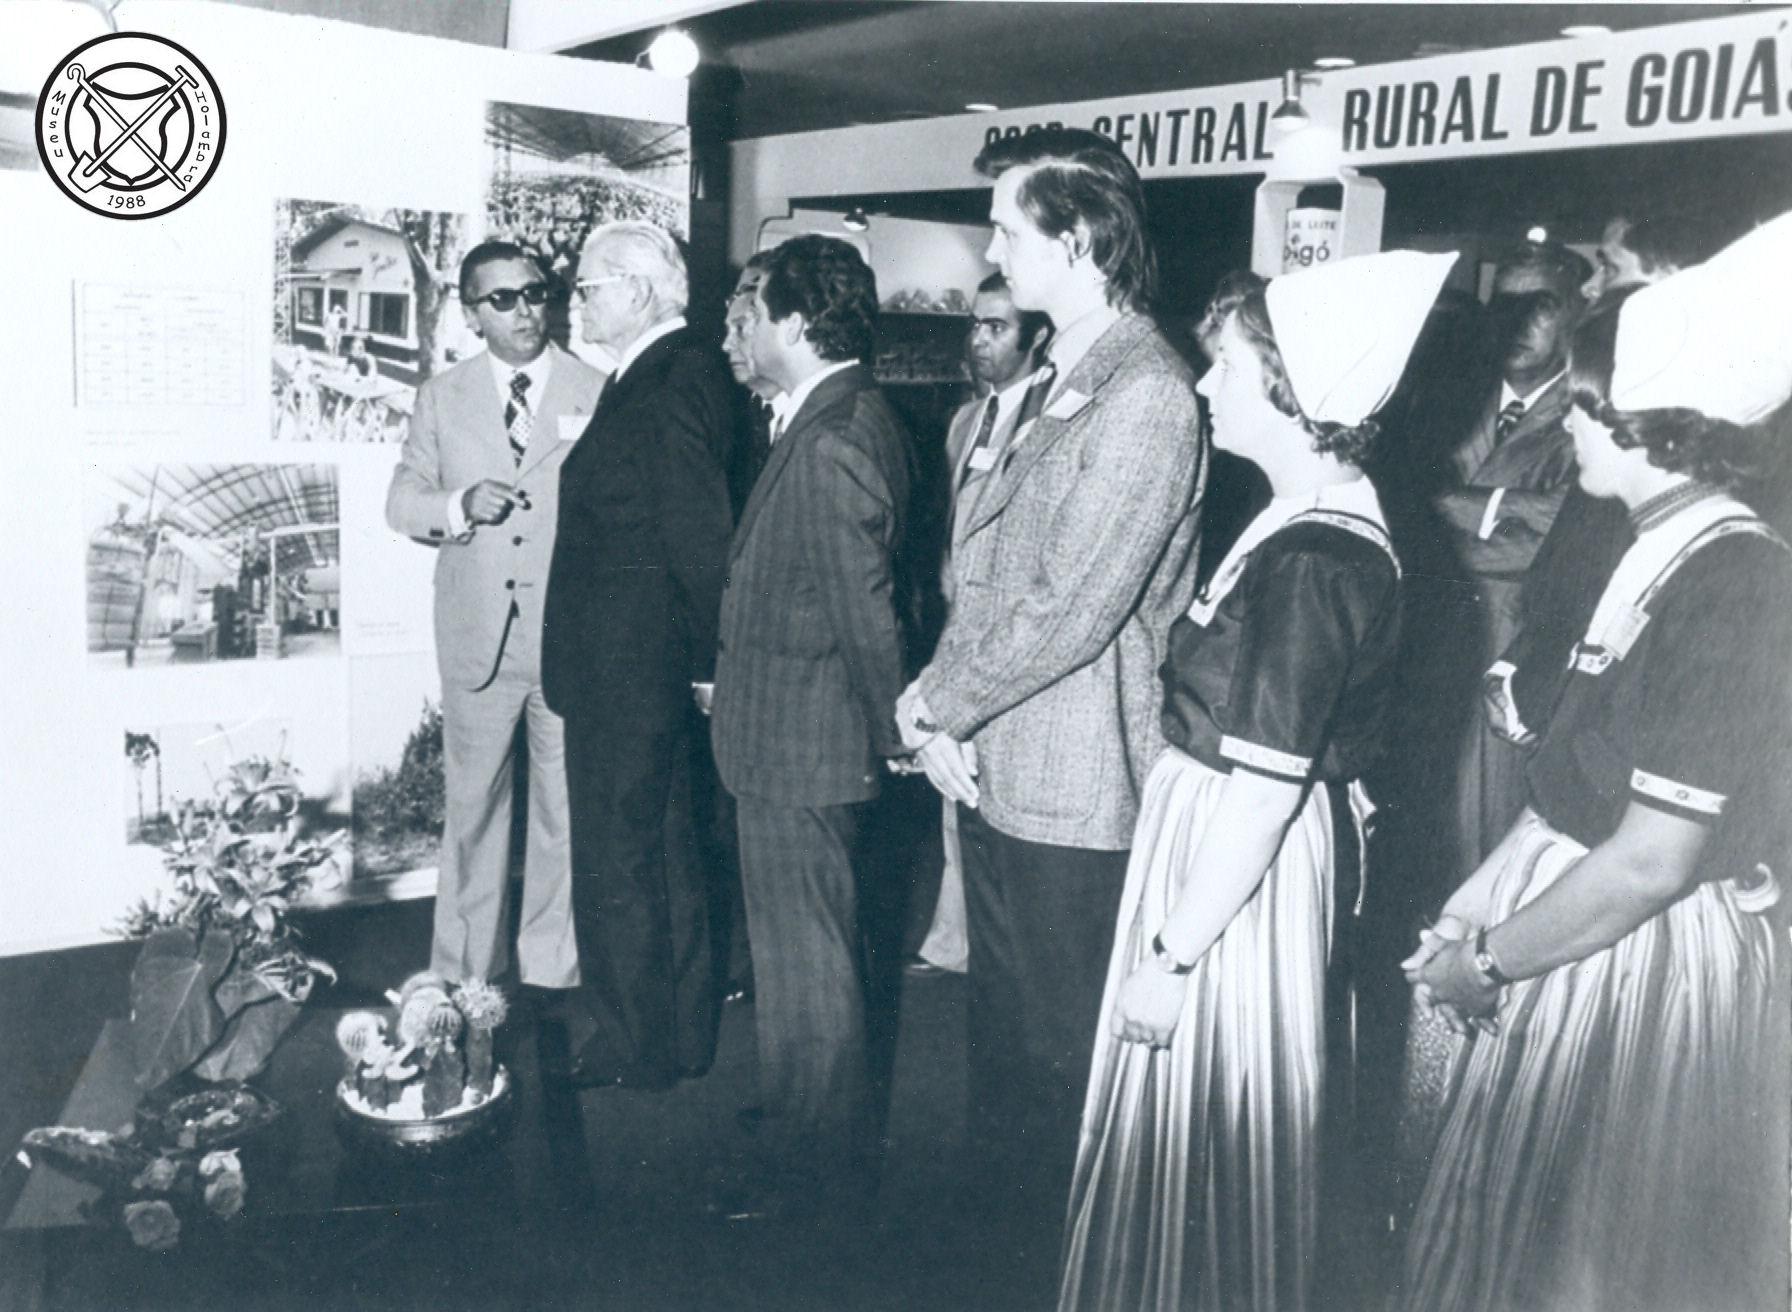 VII Braziliaanse Congres over Coöperativisme in Brasília